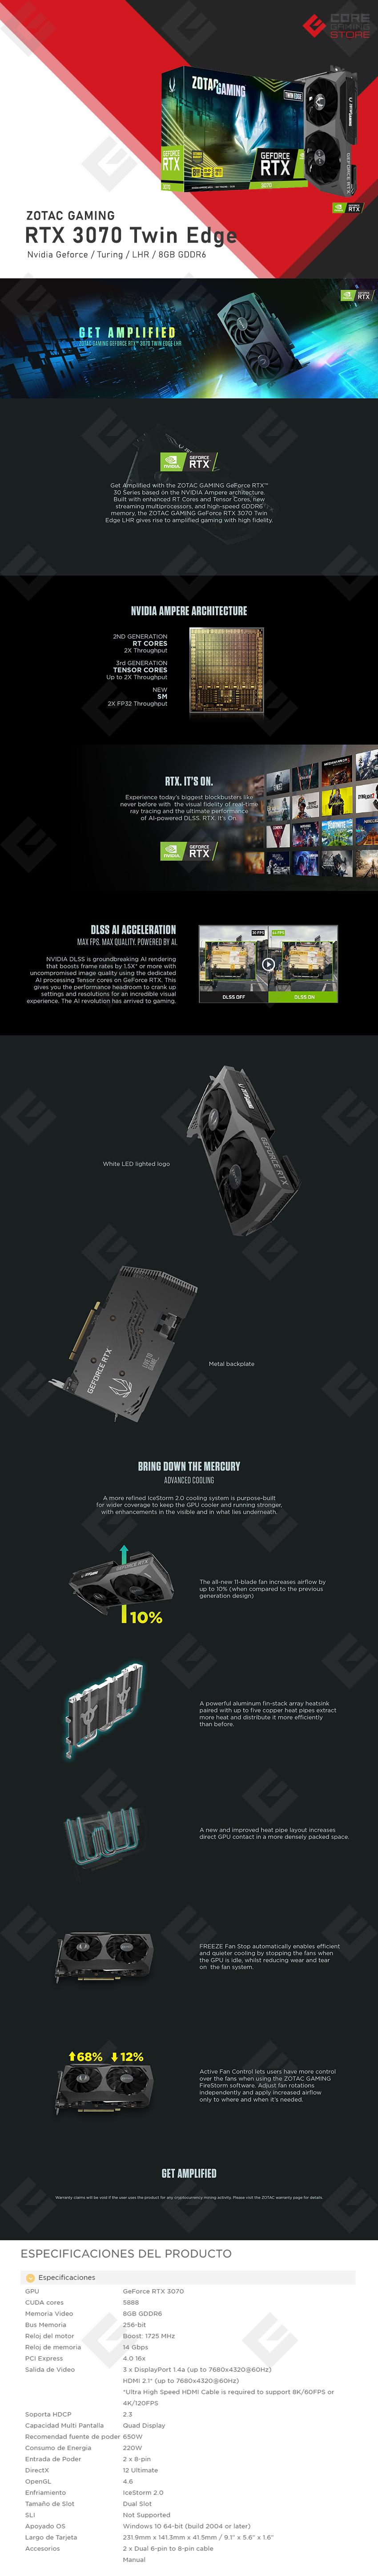 Tarjeta de Video Nvidia Zotac Gaming Geforce RTX 3070 Twin Edge LHR, 8GB GDDR6, - ZT-A30700E-10PLHR - (Venta exclusiva por transferencia electrónica o depósito bancario)